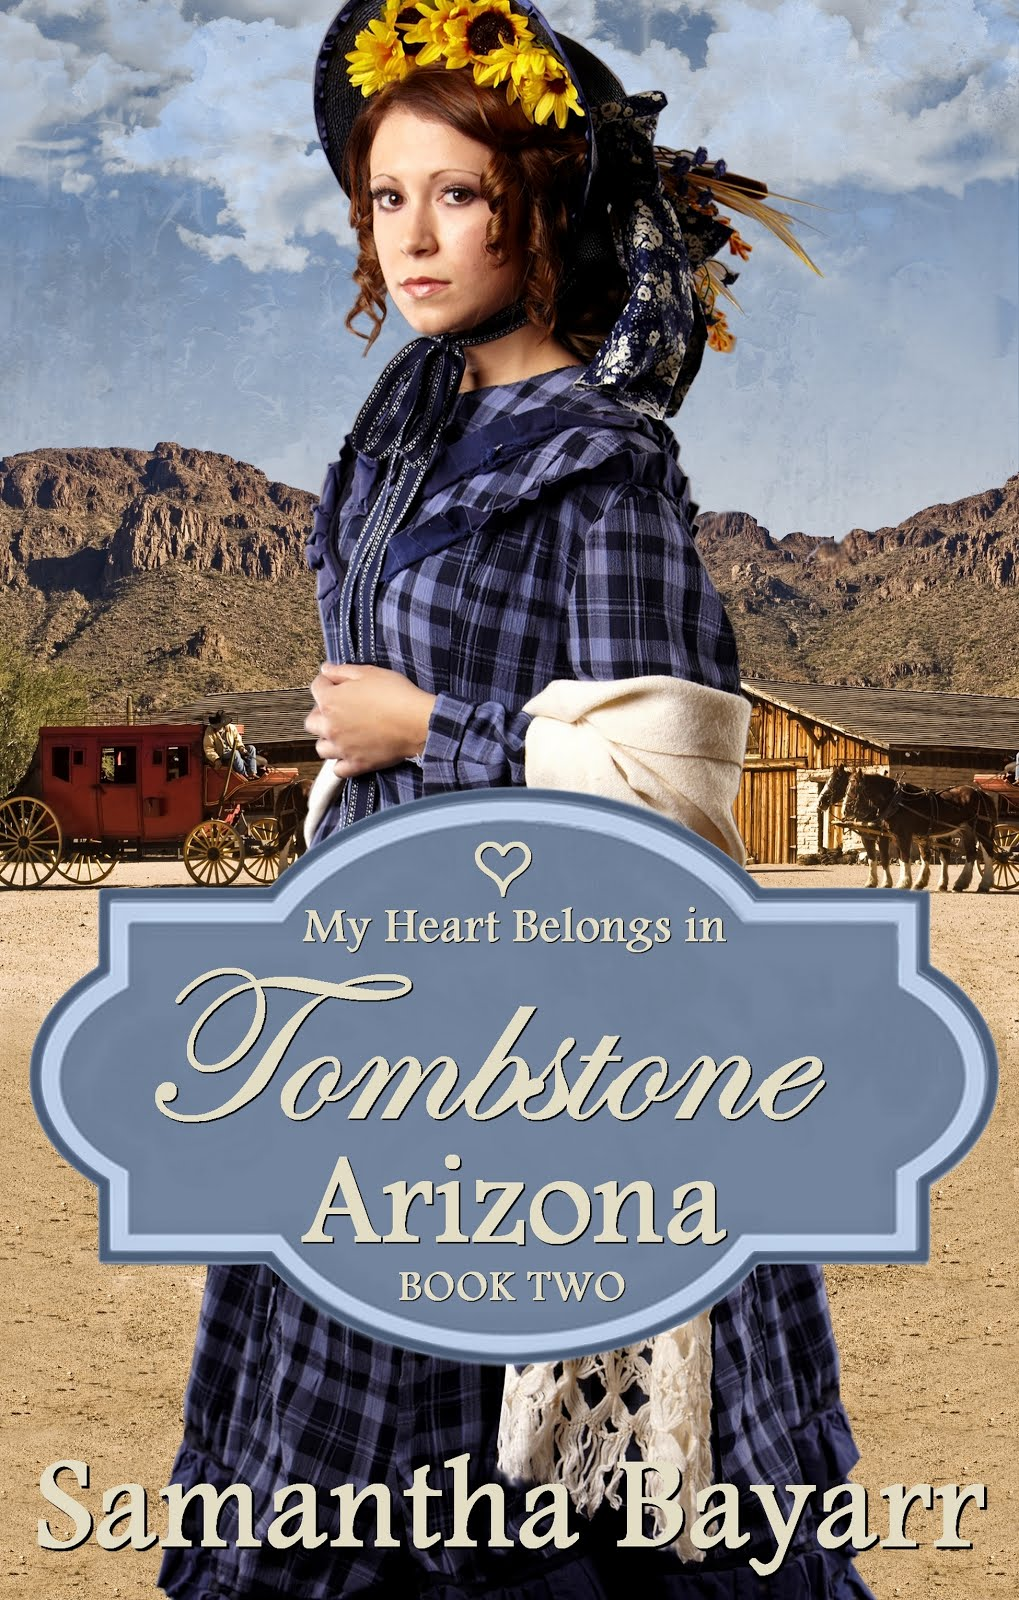 My Hear Belongs in Tombstone, Arizona